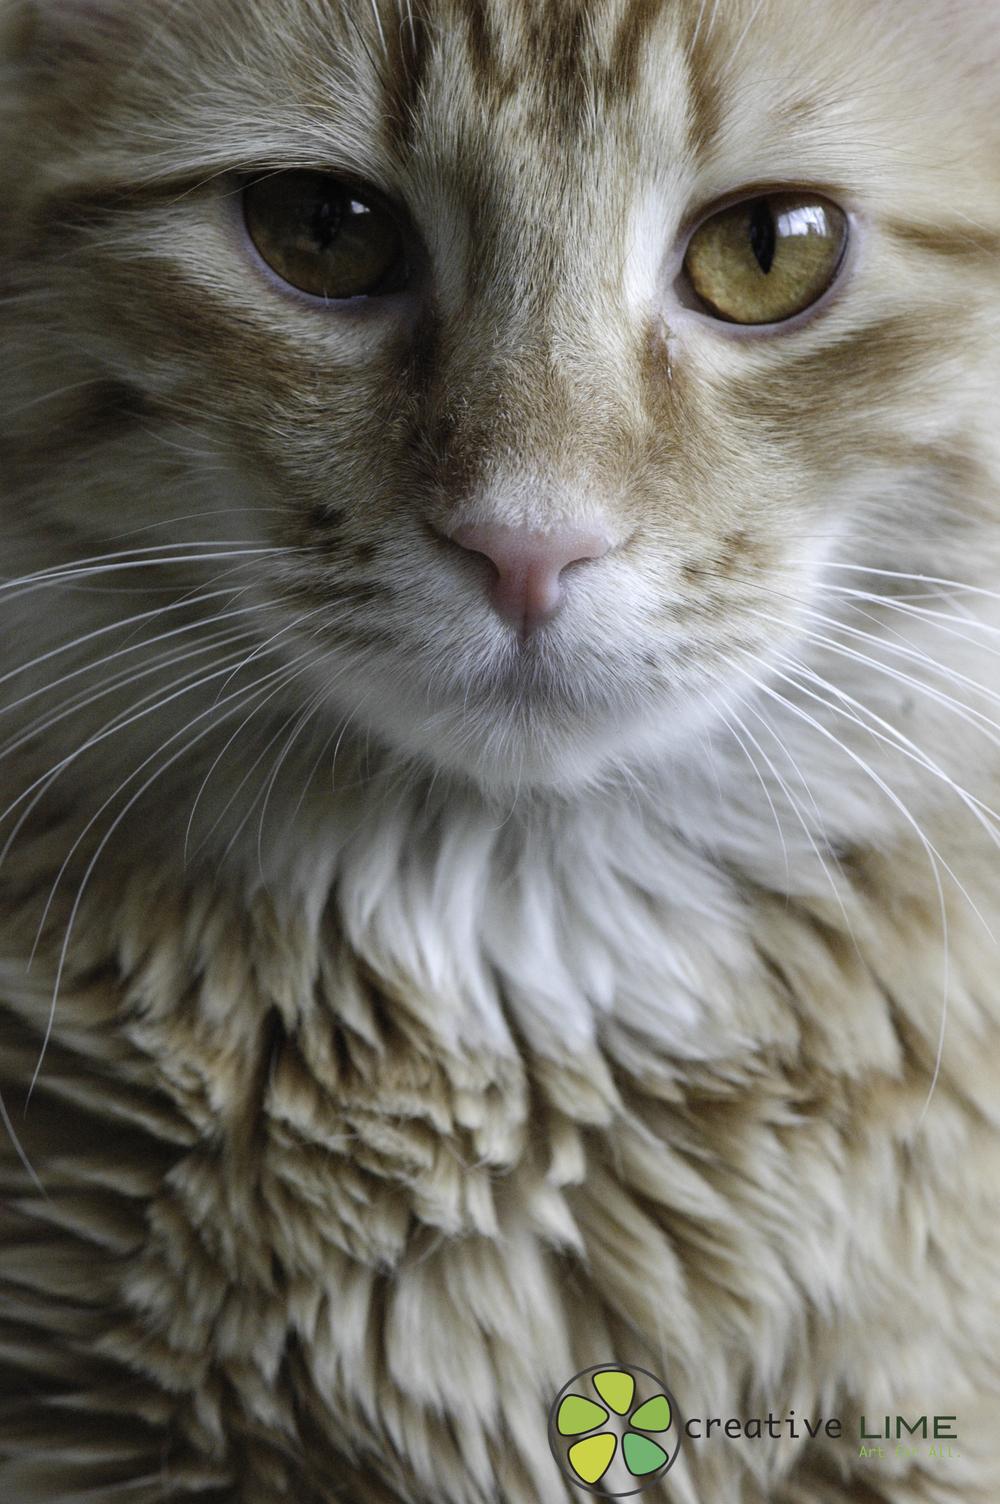 Cat Creative LIME.jpg